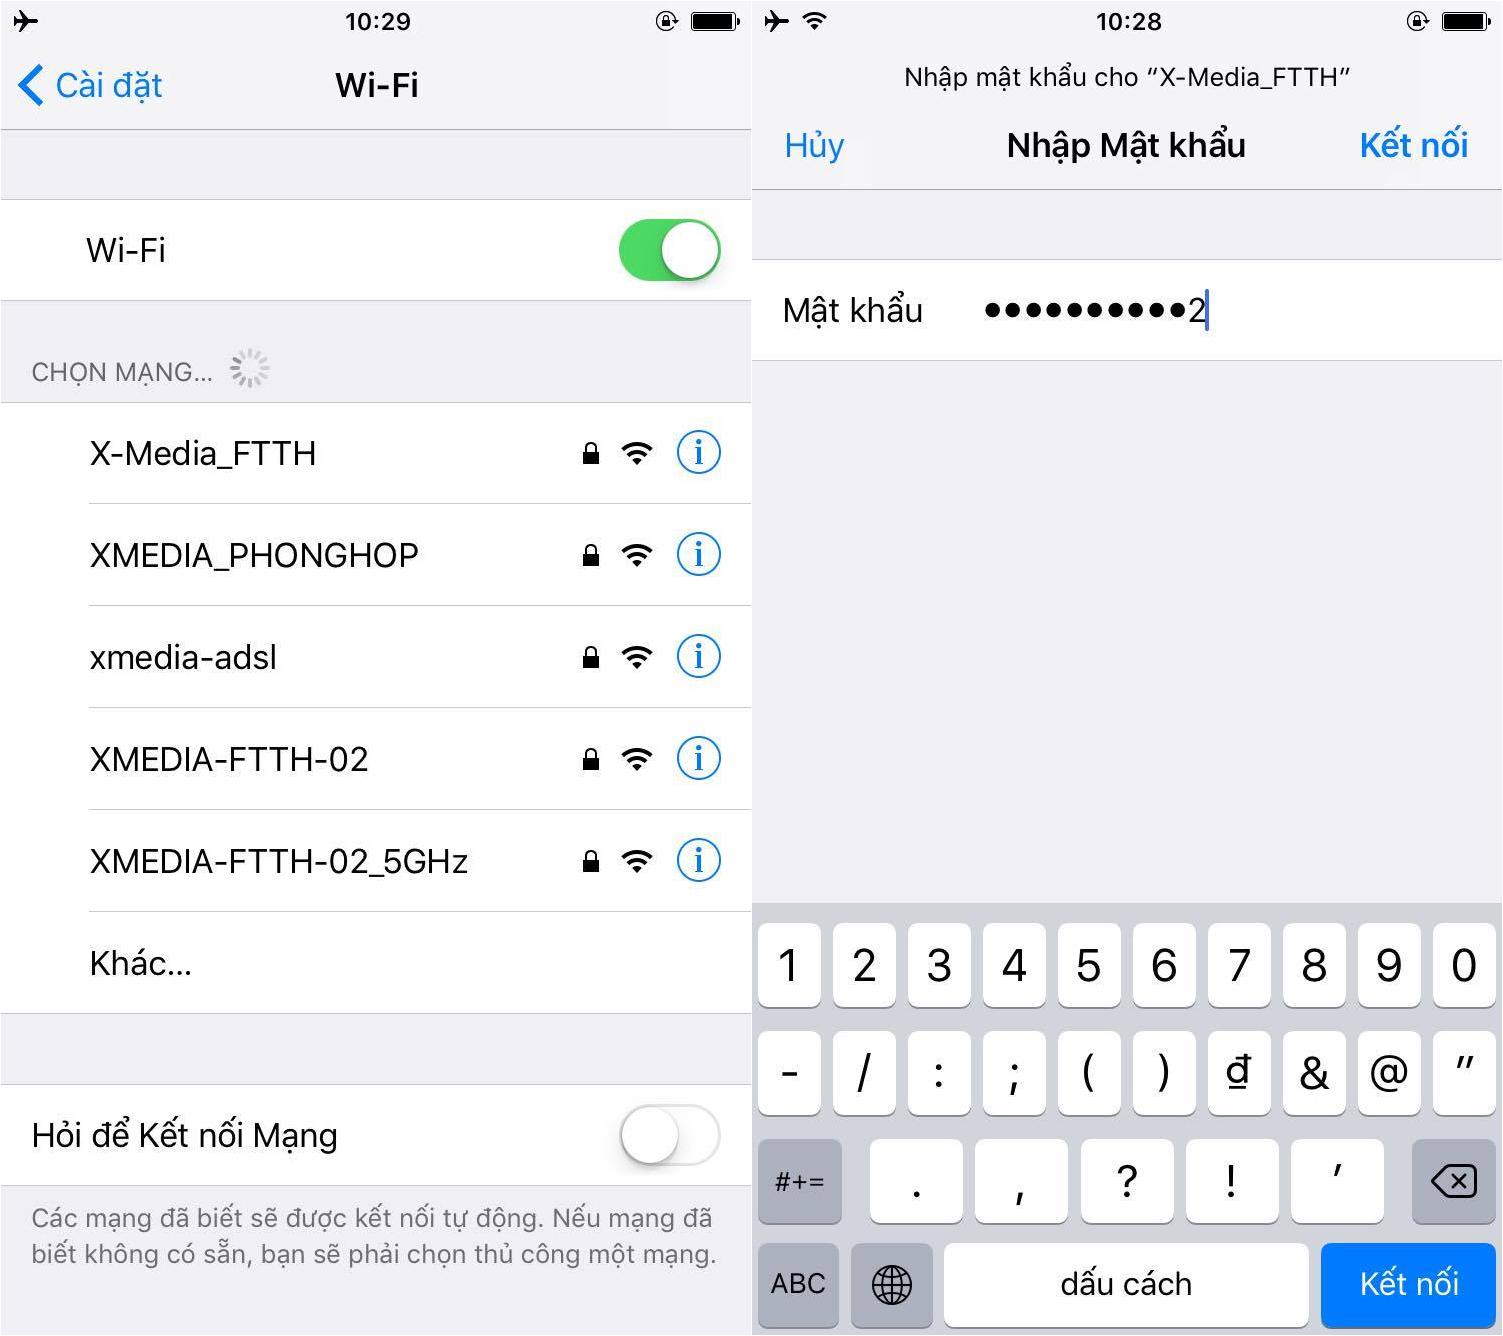 cach sua loi iphone khong bat duoc wifi 4